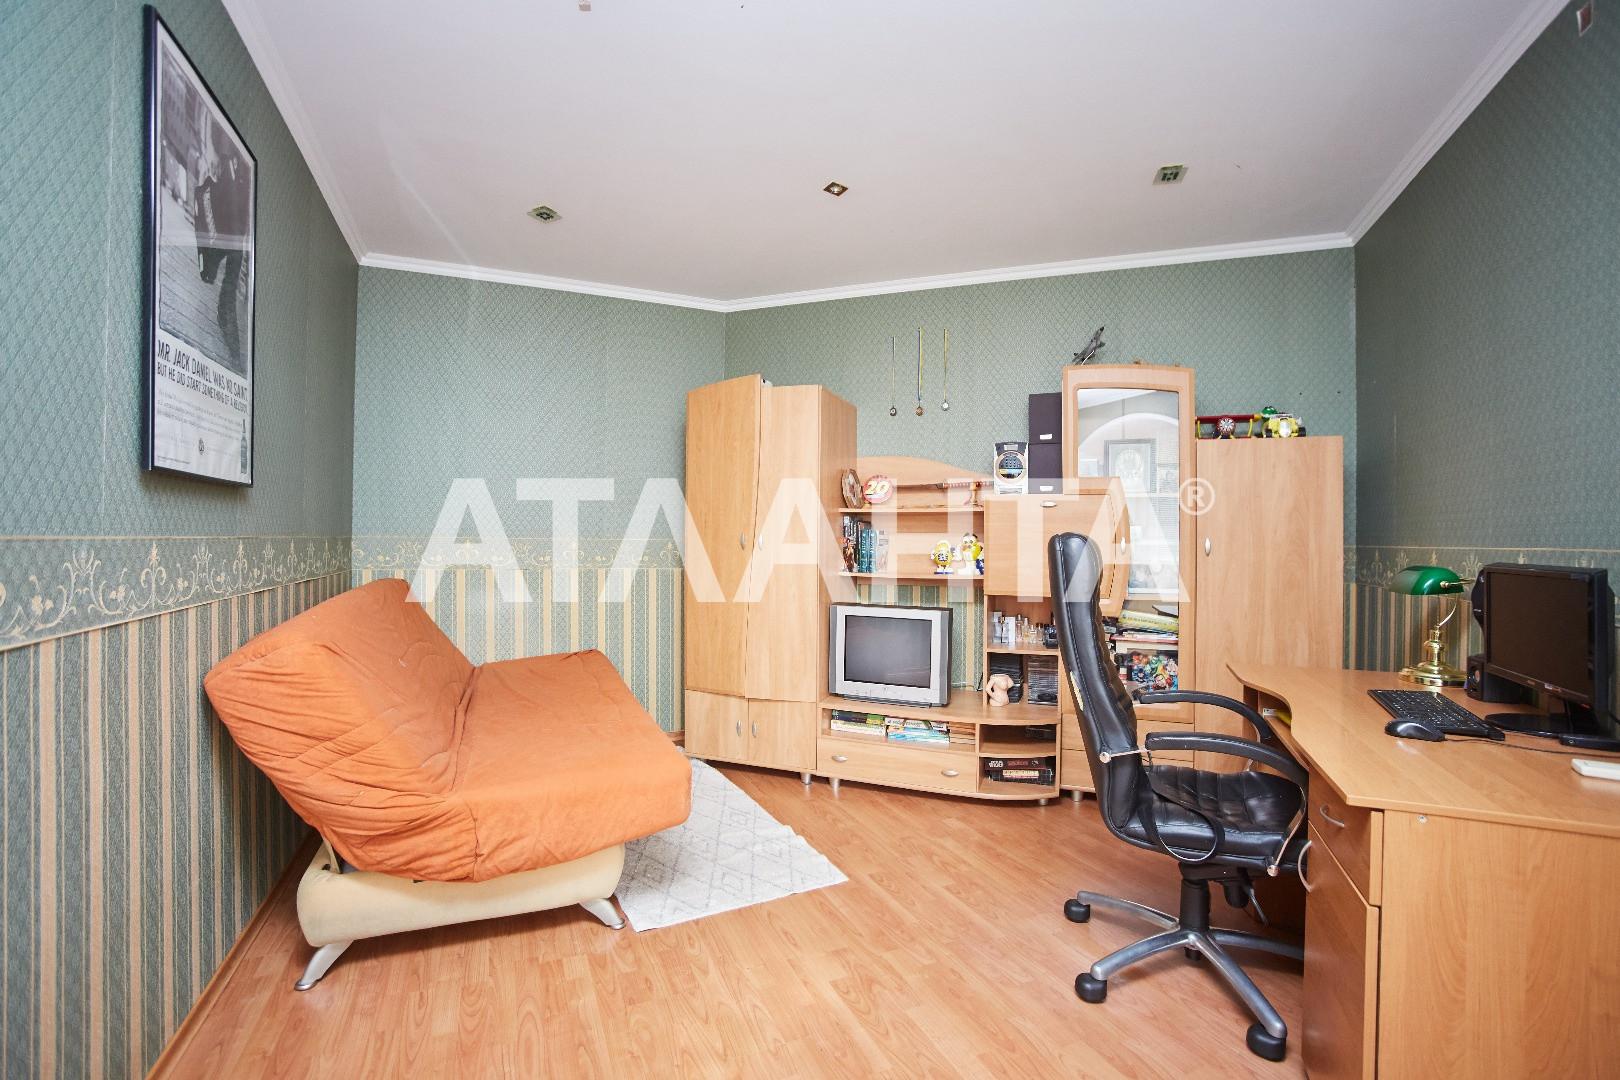 Продается Многоуровневая Квартира на ул. Посмитного — 295 000 у.е. (фото №2)